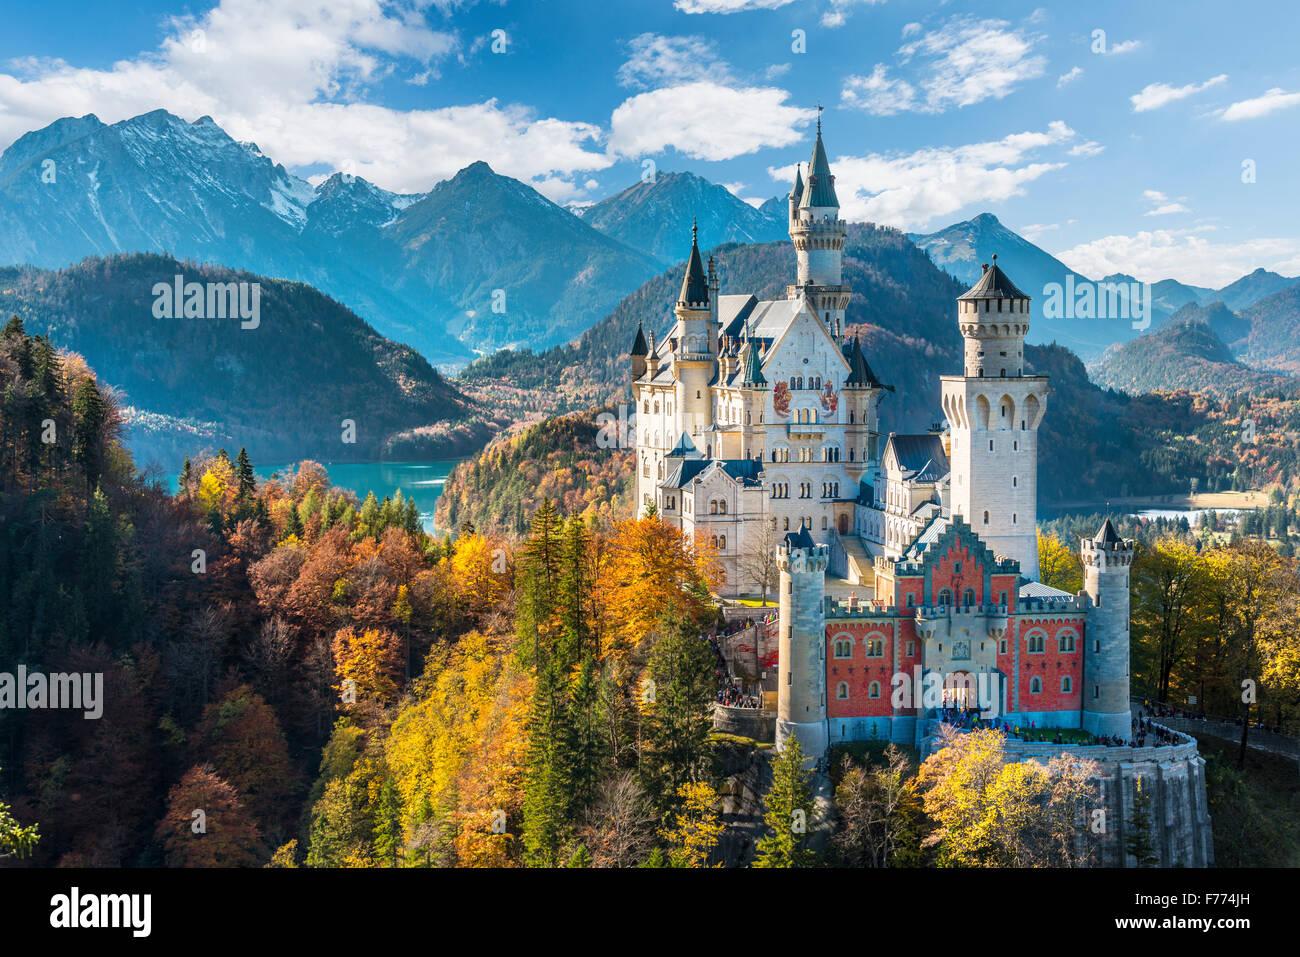 El castillo de Neuschwanstein en otoño, Alpsee detrás, Schwangau, Ostallgäu, Allgäu, suabia, Alta Baviera, Baviera, Alemania Foto de stock